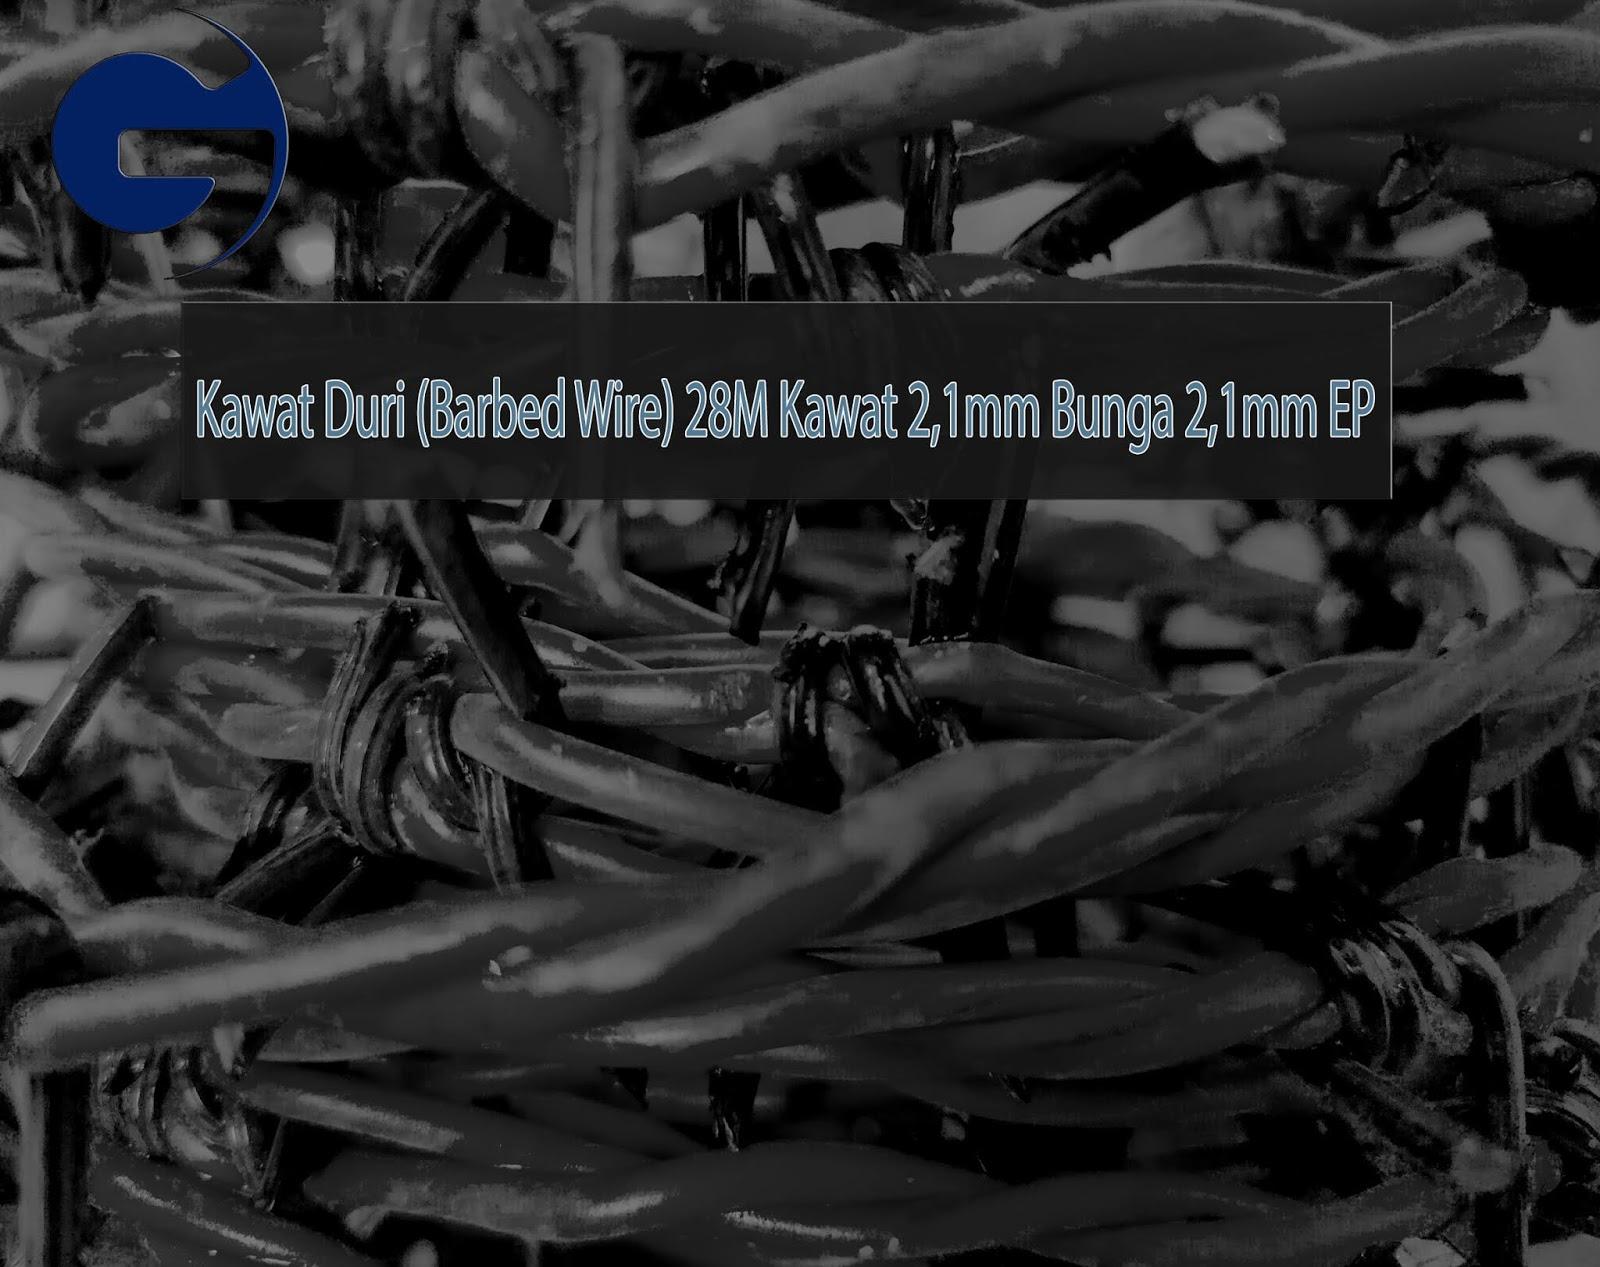 Jual Kawat Duri SNI 28M Kawat 2,1mm bunga 2,1mm EP